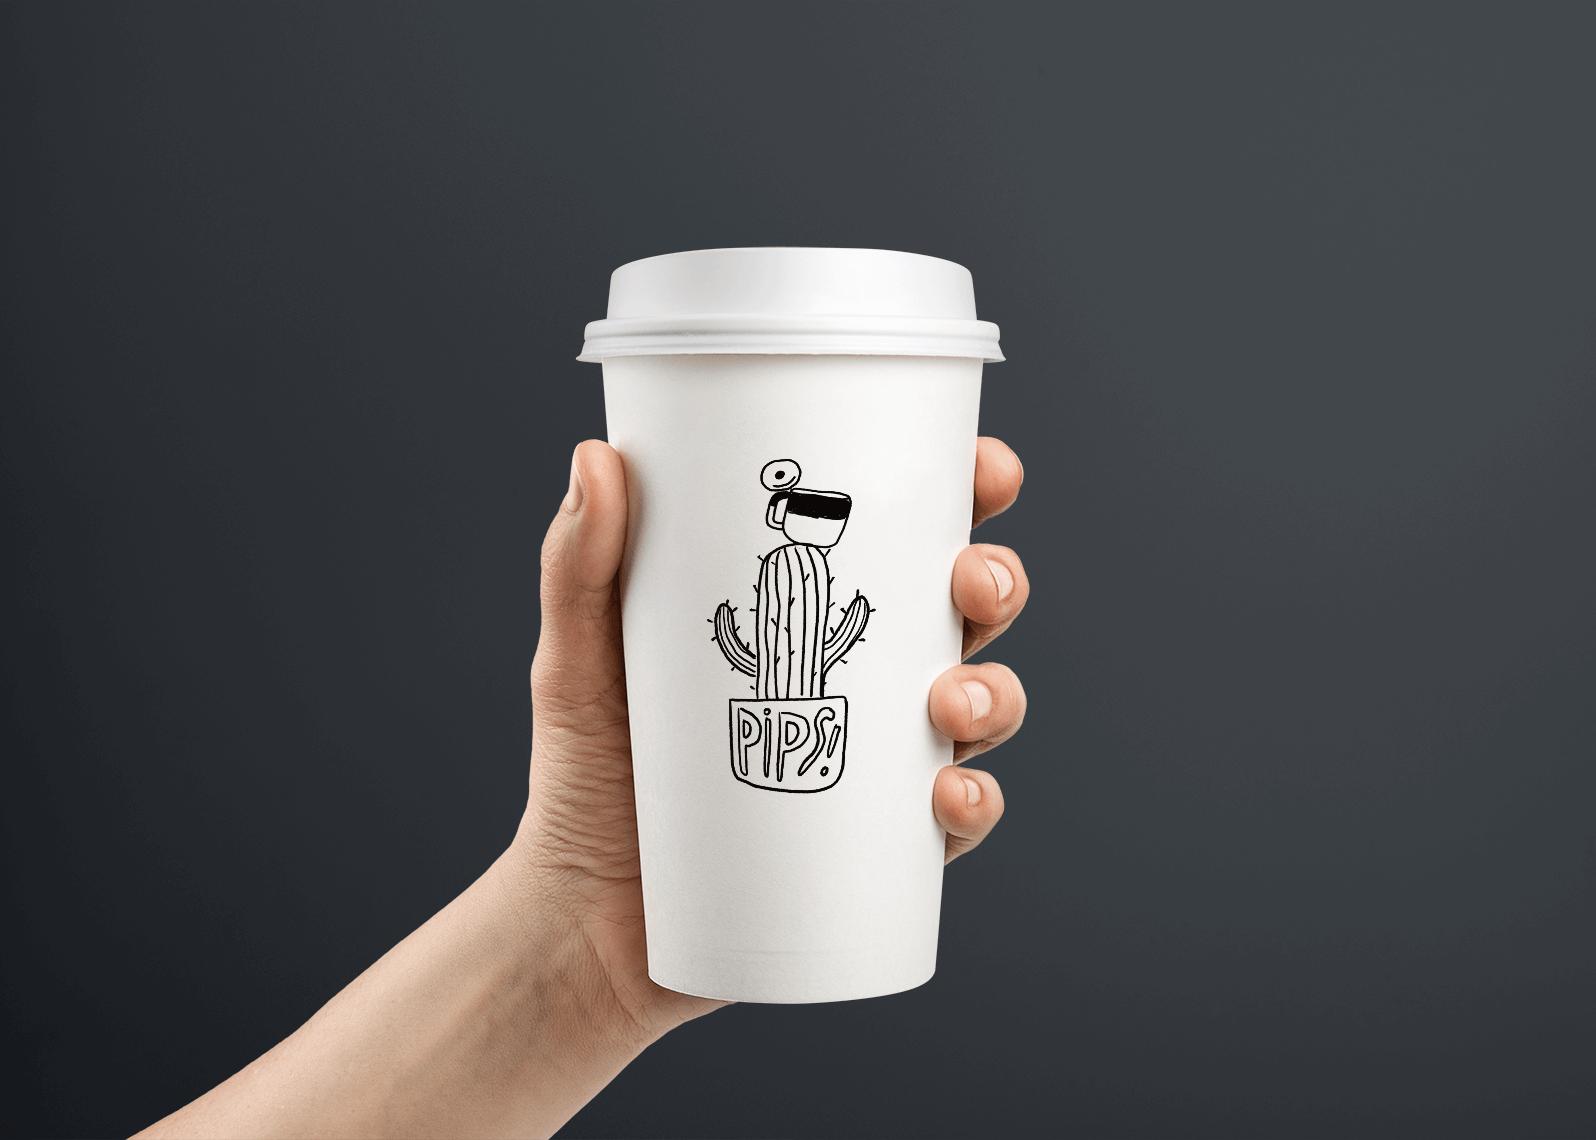 Medium-cup_mockup-thumb